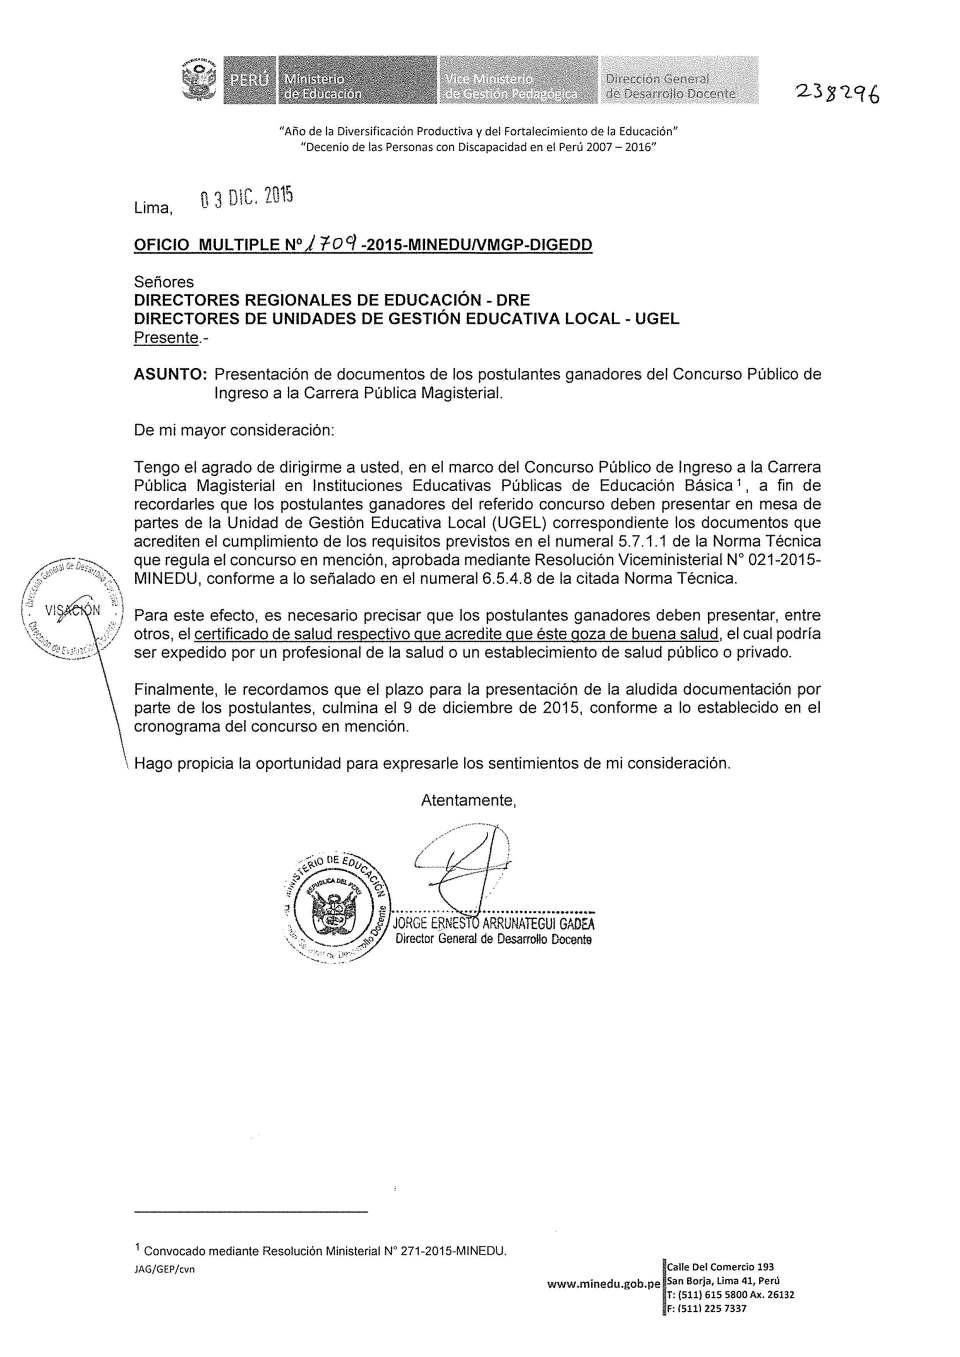 OFICIO MULTIPLE No.1709-2015-MINEDU-VMGP-DIGEDD